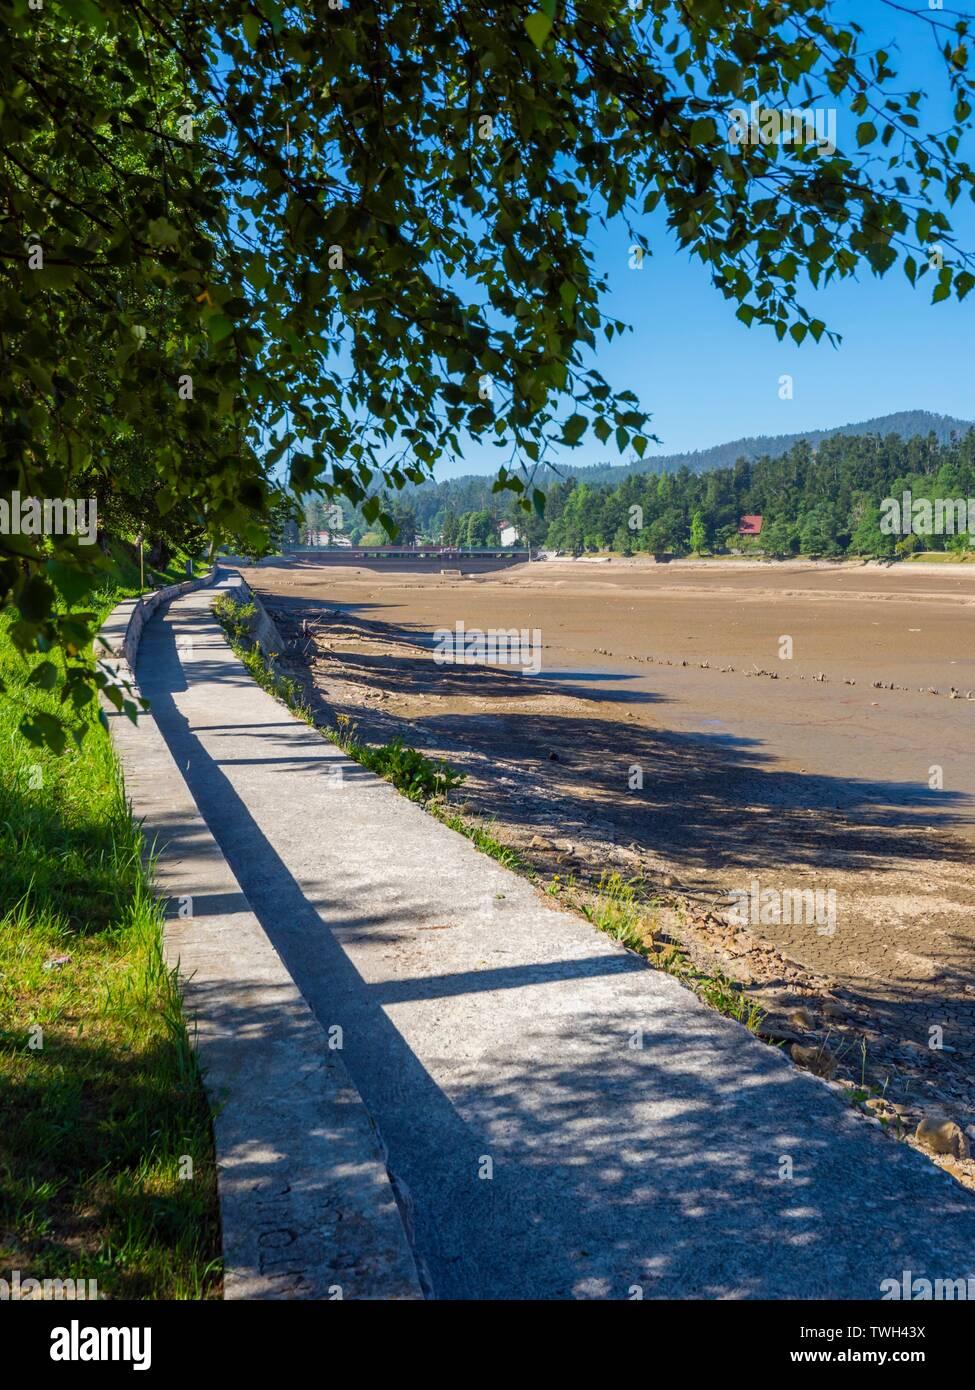 Dried lake-bed Bajer in Fuzine Croatia Spring 2019 coastline promenade Stock Photo